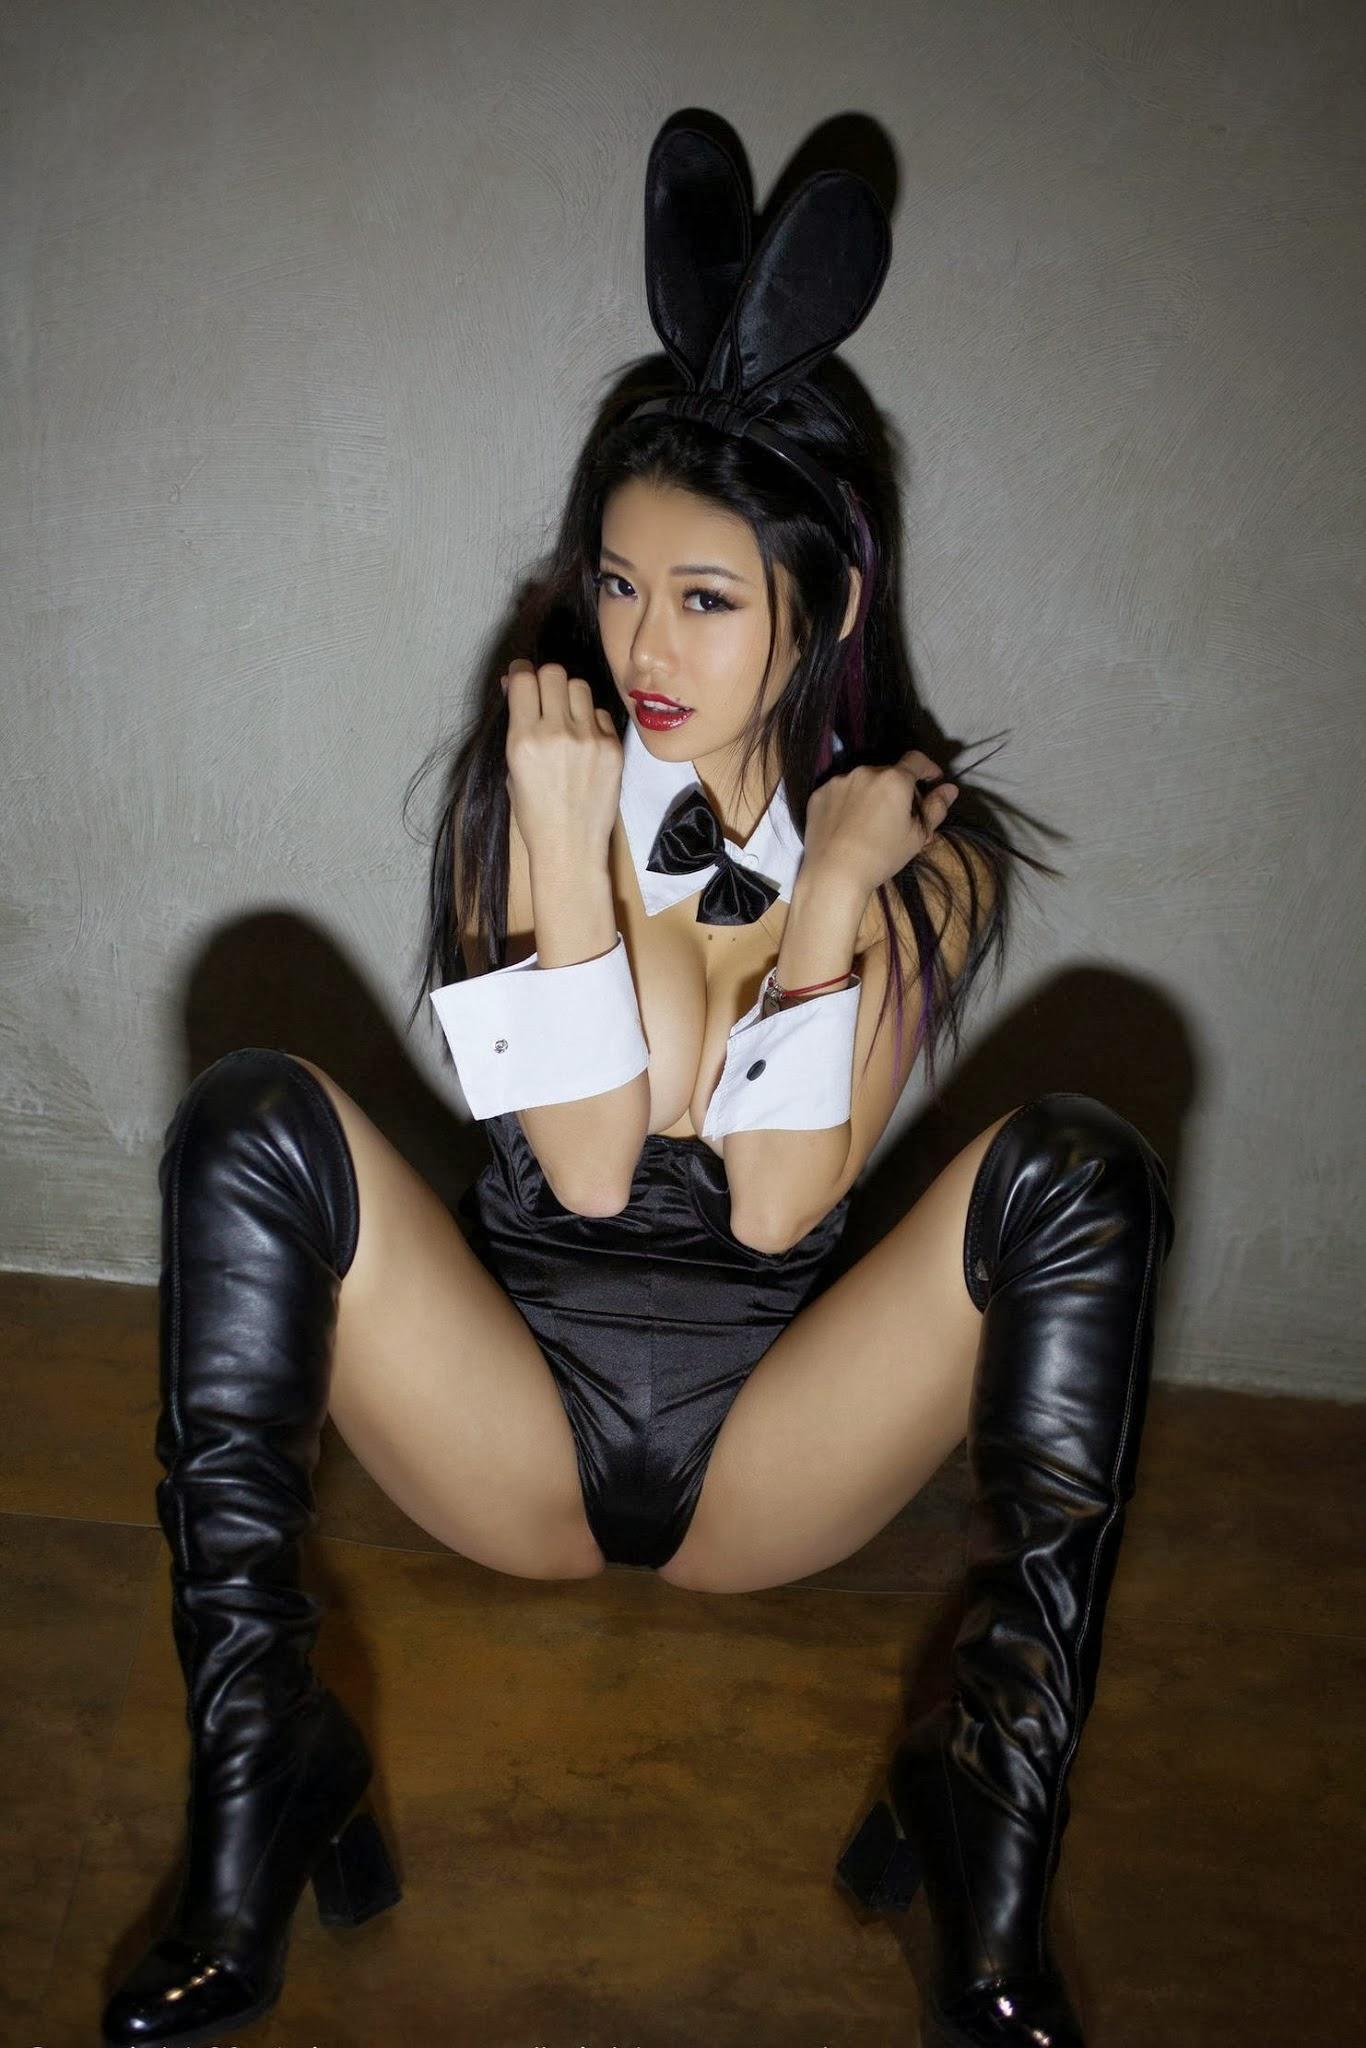 Luvian Ben Neng  Topless  Bunny Girl Cosplay Uhd -7560